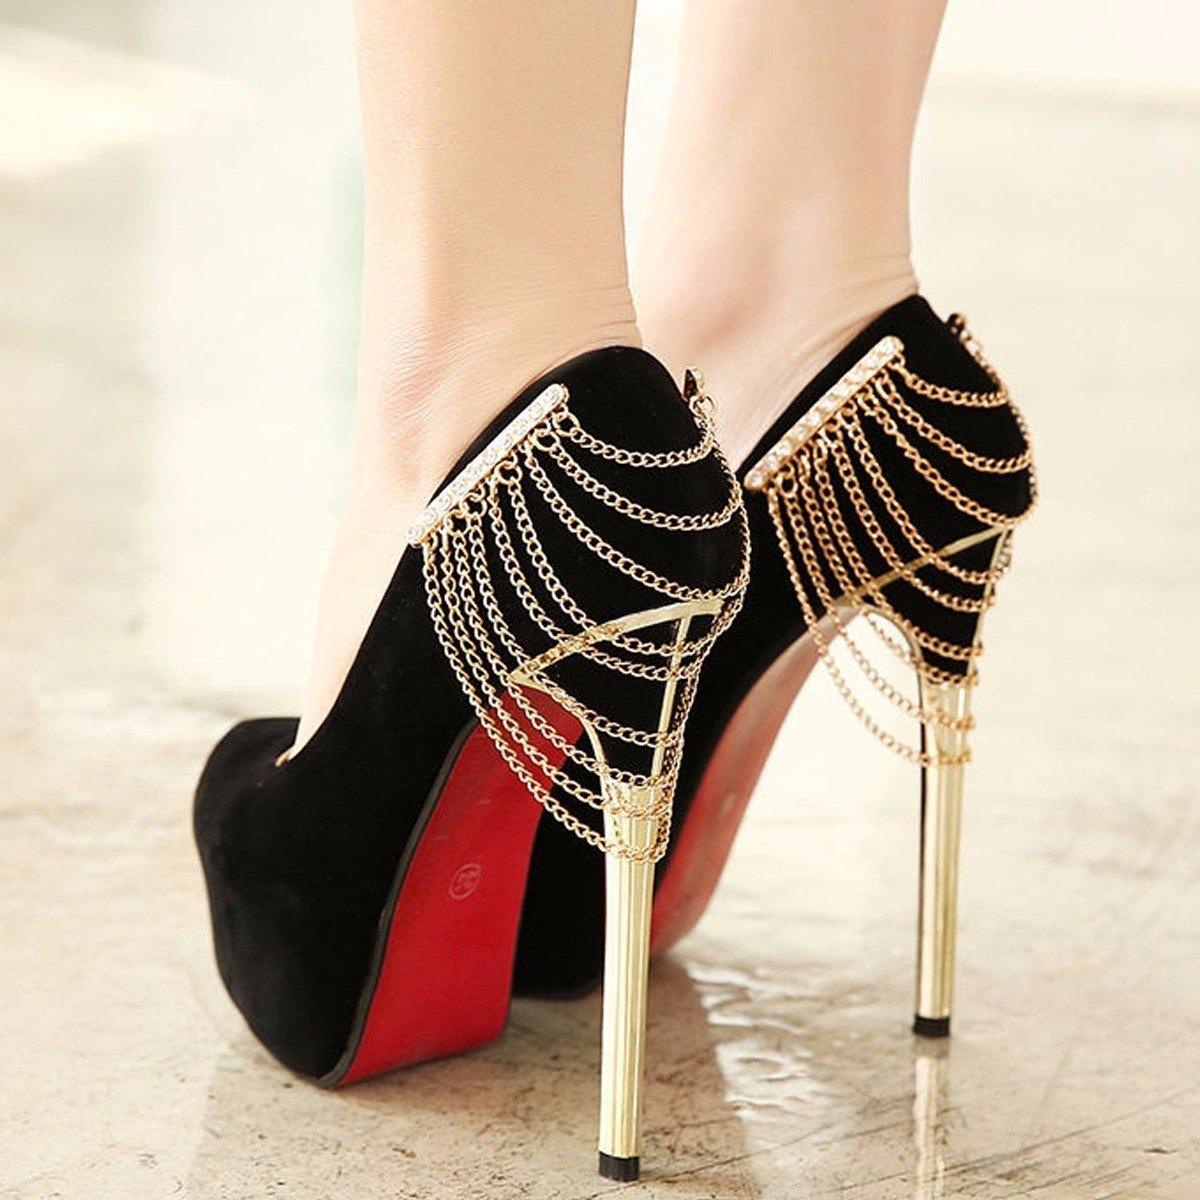 a746508504 scarpin importado sapato belo festa sandália salto alto top. Carregando  zoom.